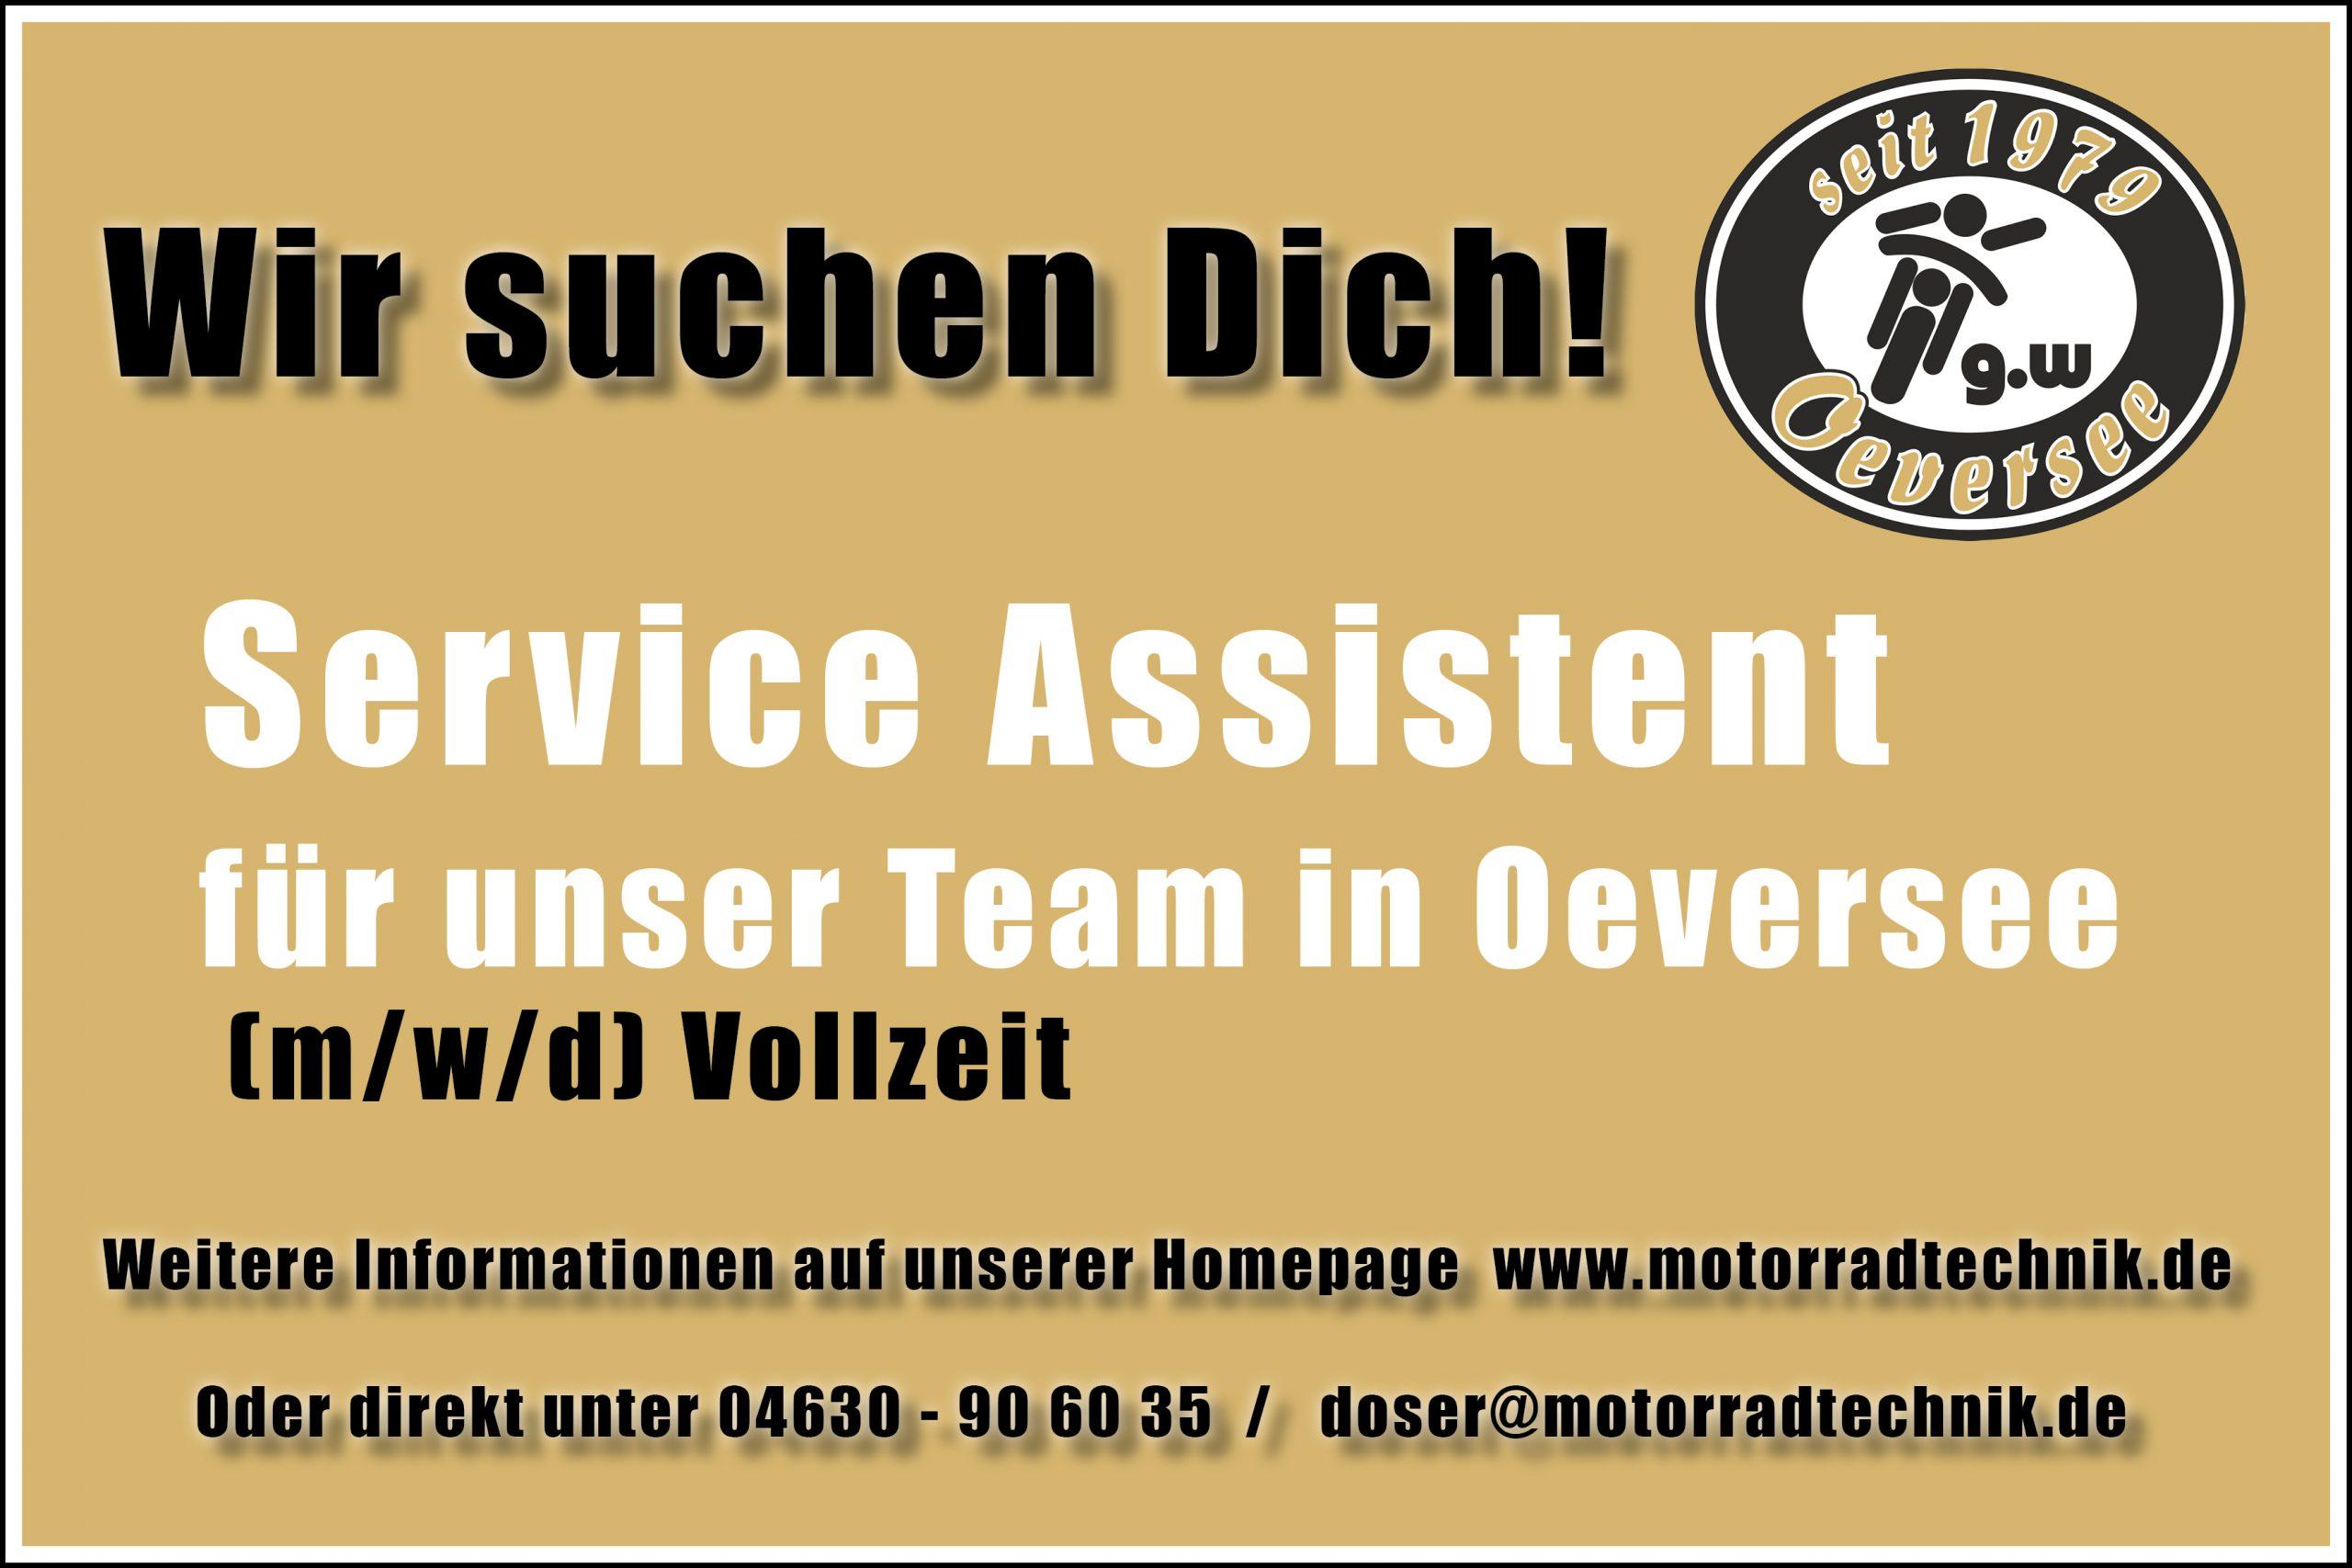 Wir suchen Dich! Service Assistent (m/w/d)